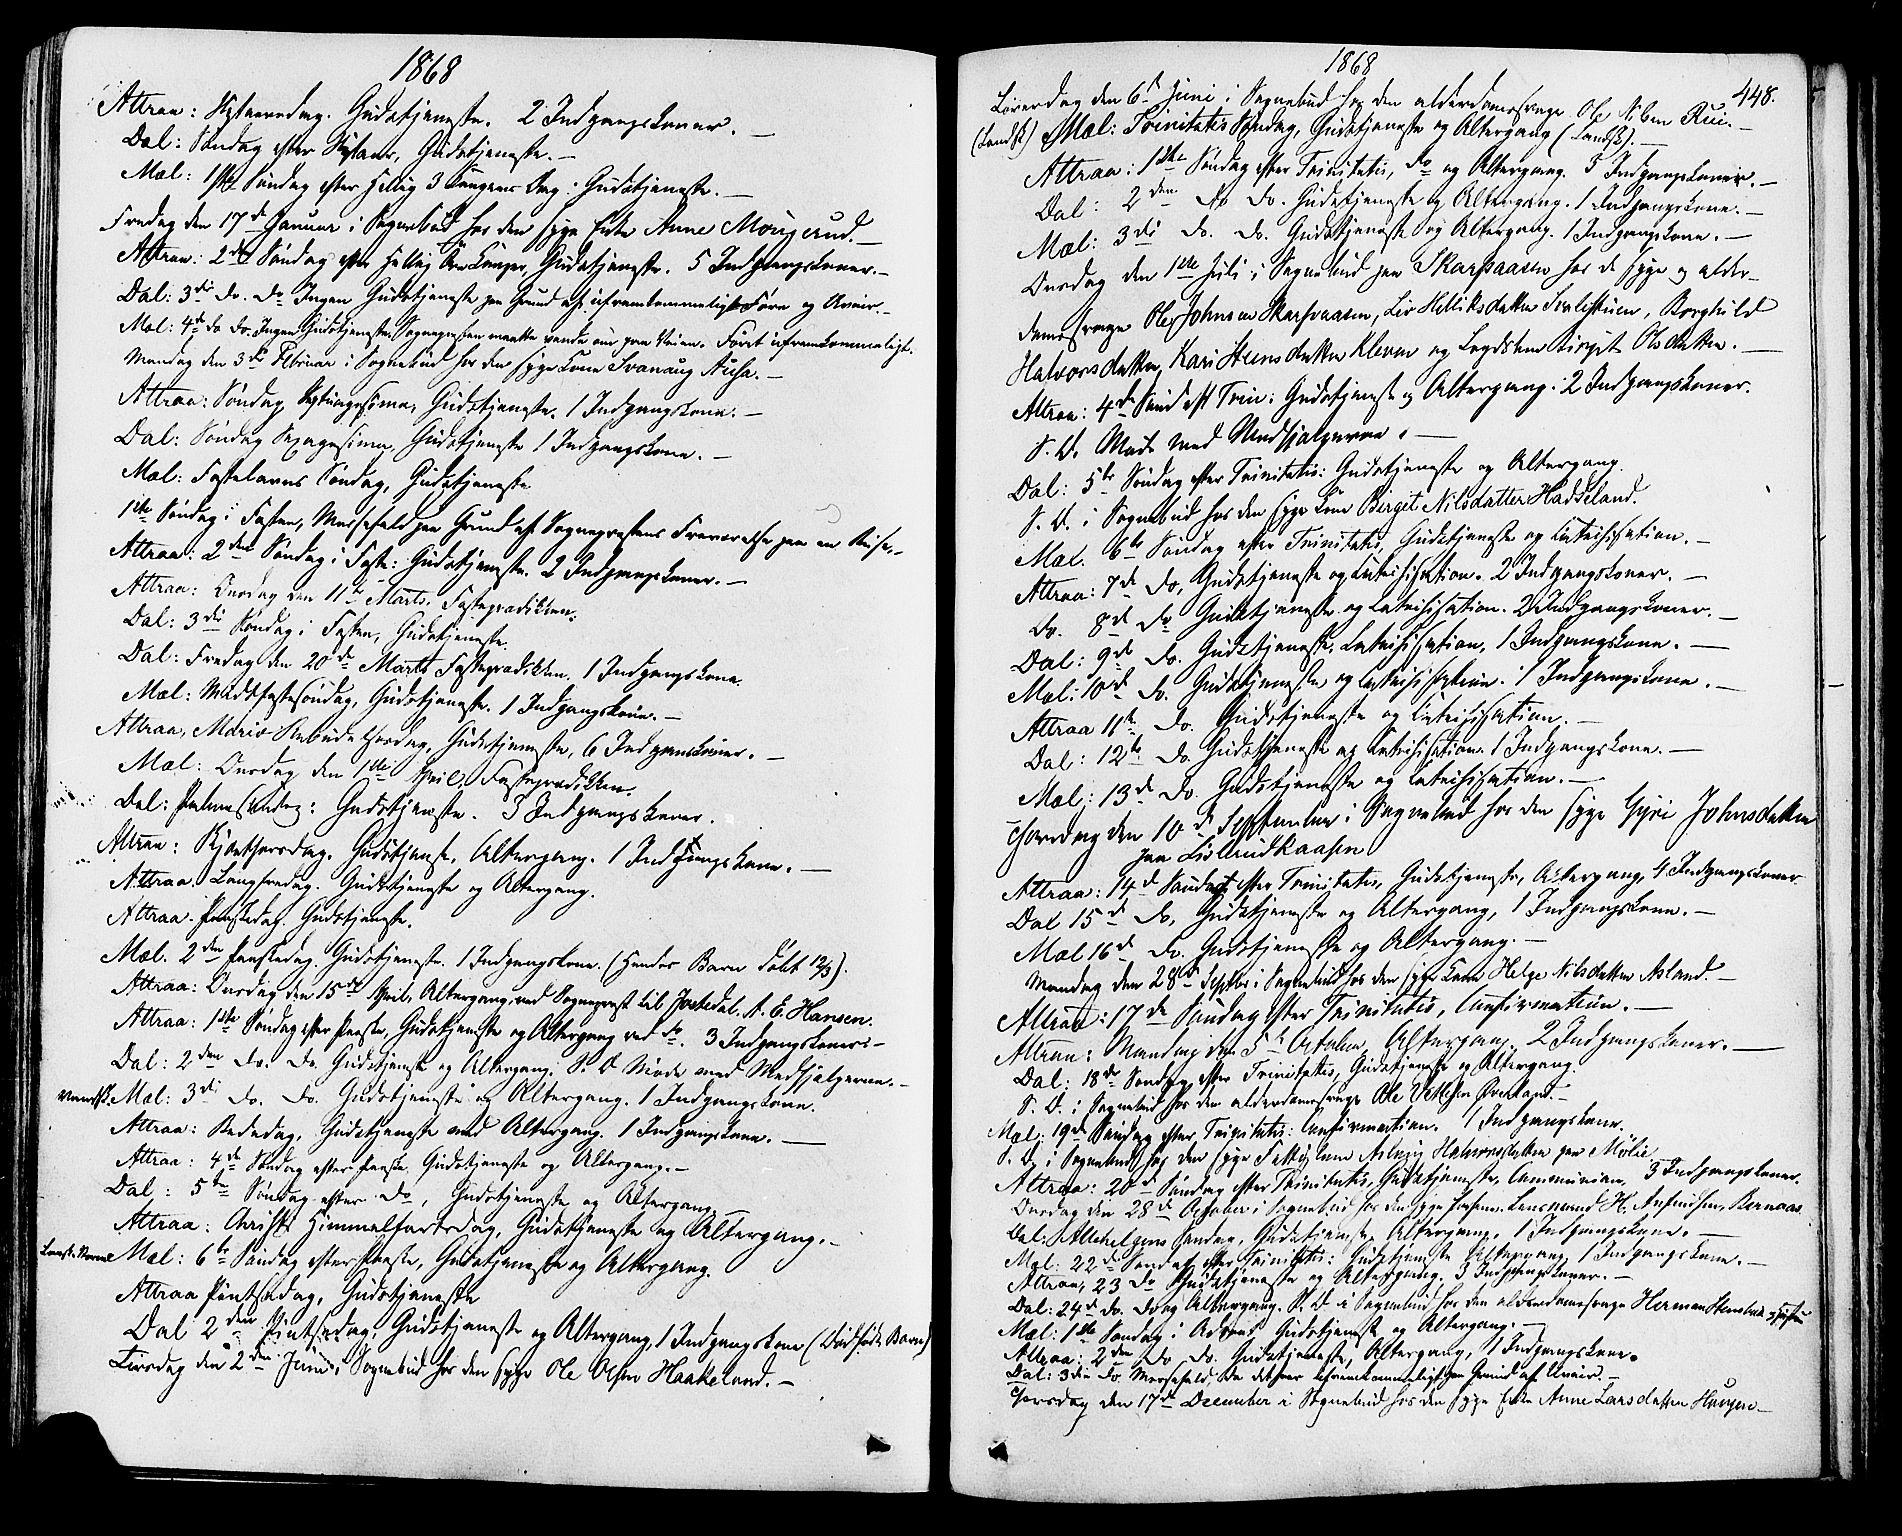 SAKO, Tinn kirkebøker, F/Fa/L0006: Ministerialbok nr. I 6, 1857-1878, s. 448